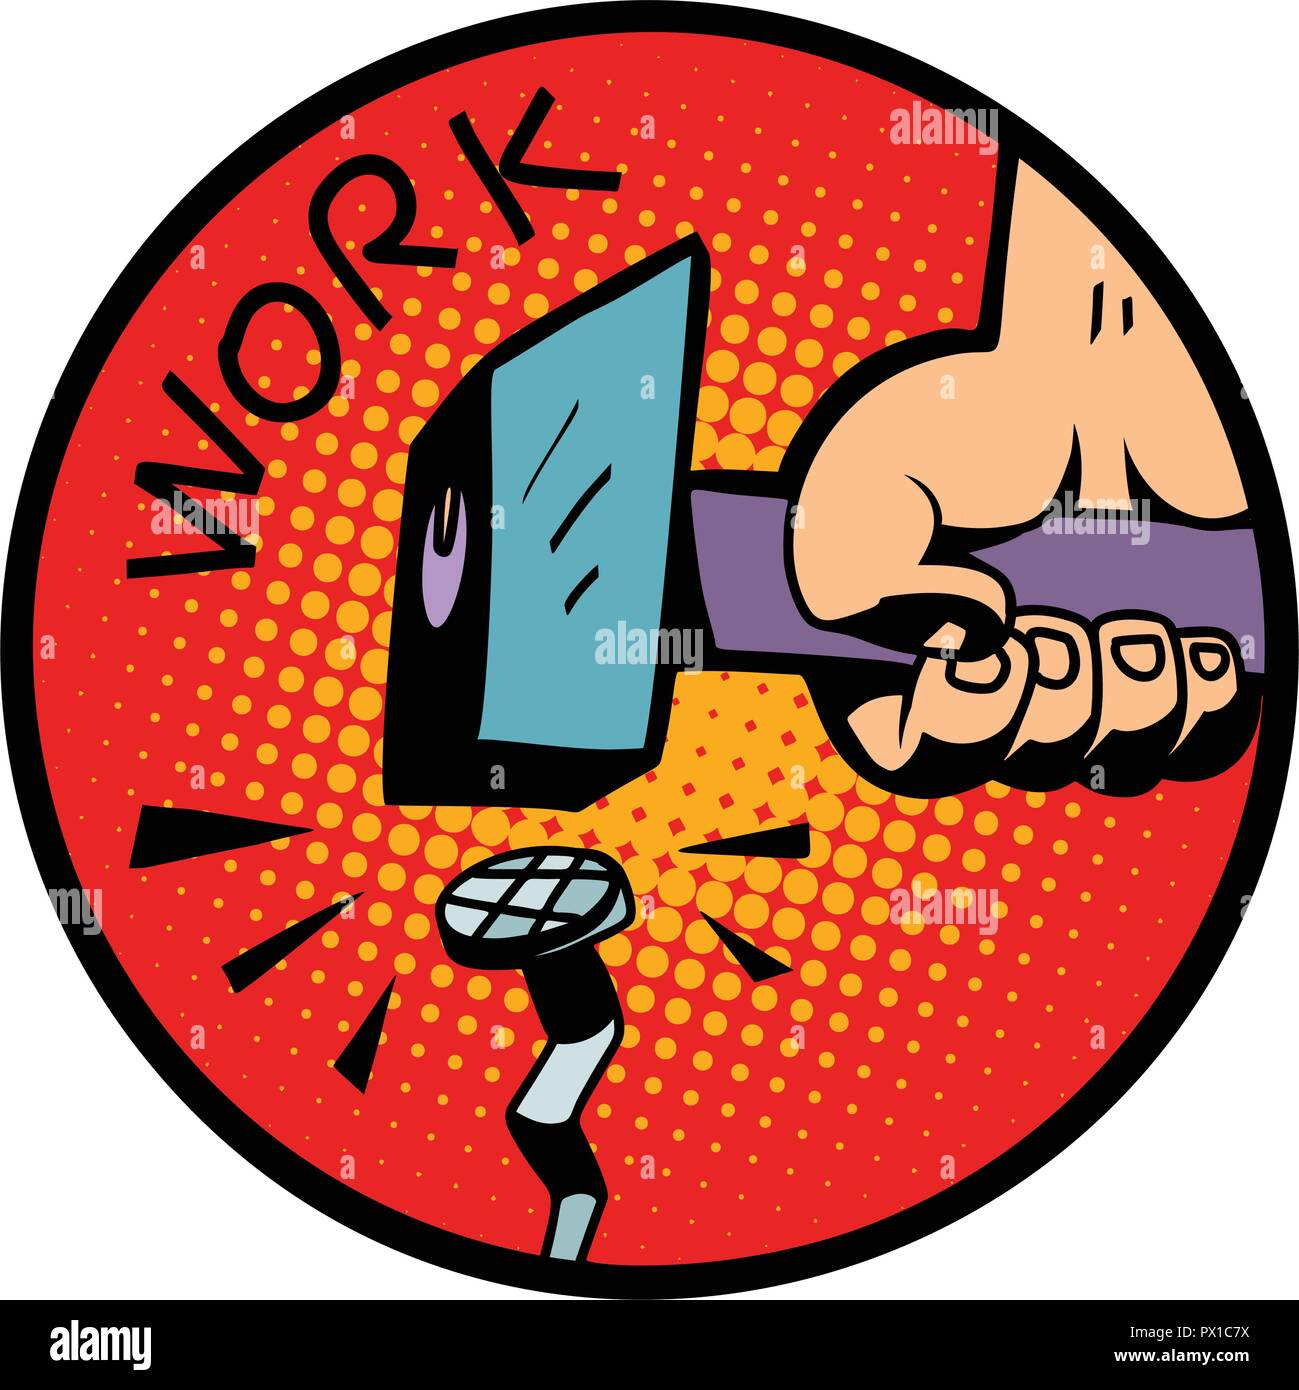 work symbol, hammer nail - Stock Vector